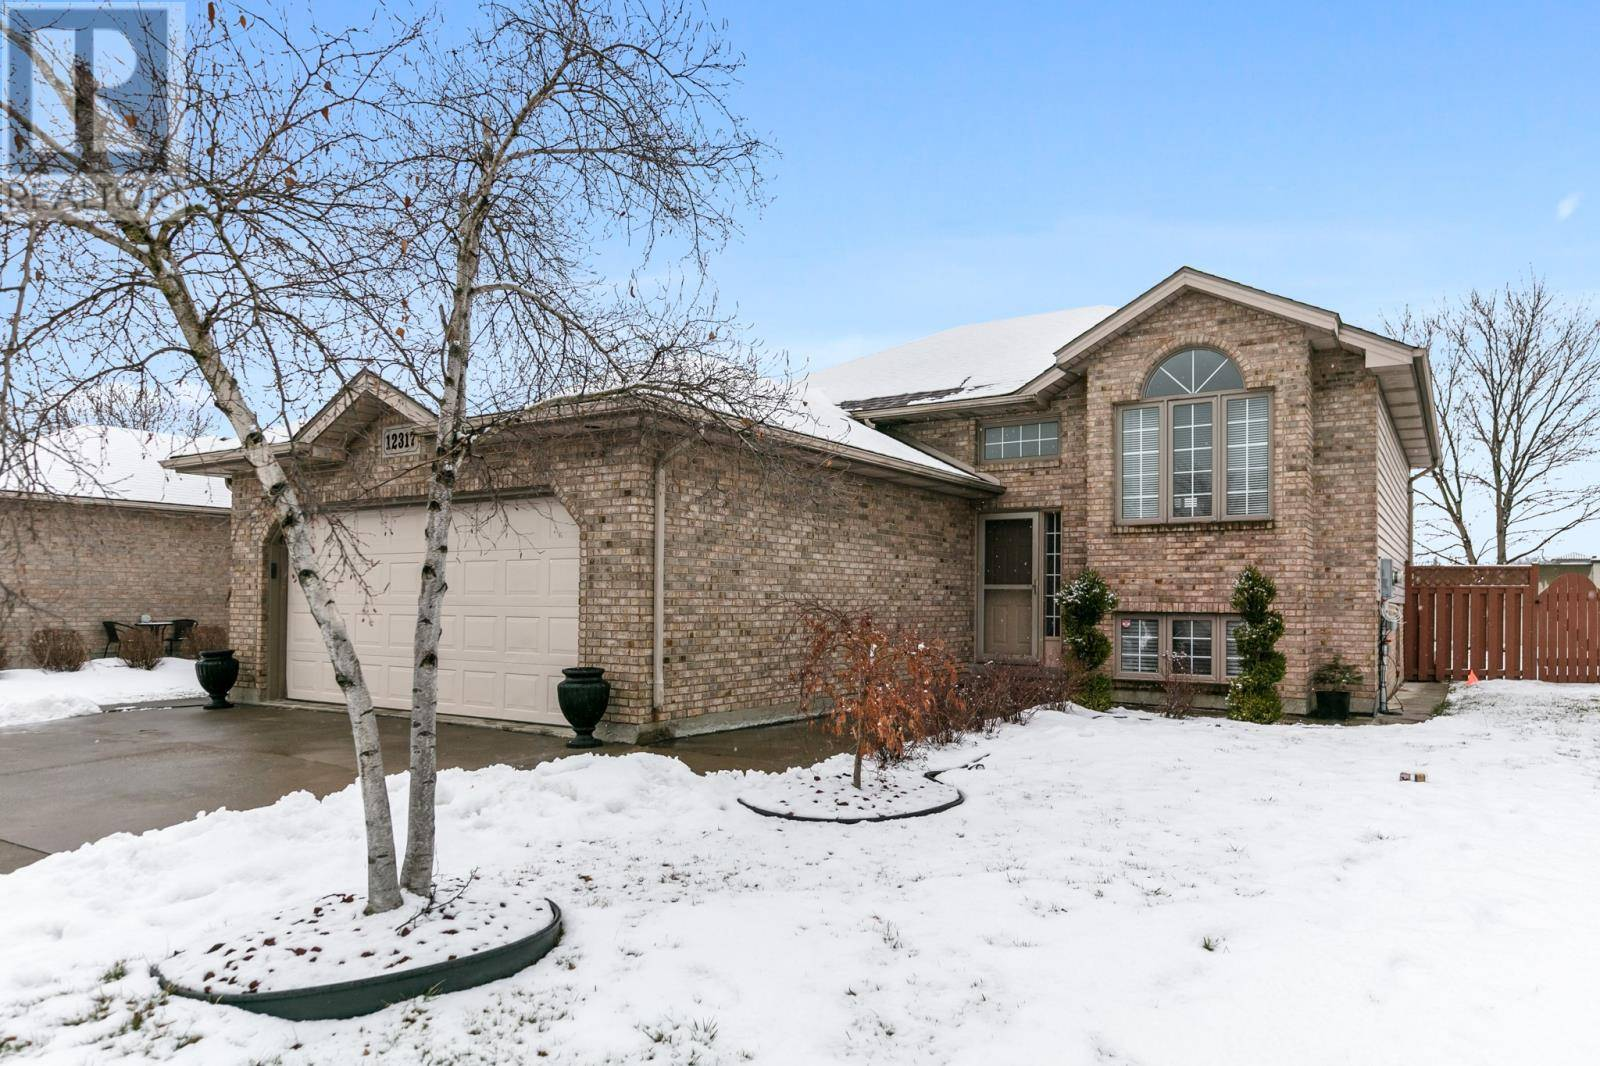 House for sale at 12317 Demarse  Tecumseh Ontario - MLS: 20001846